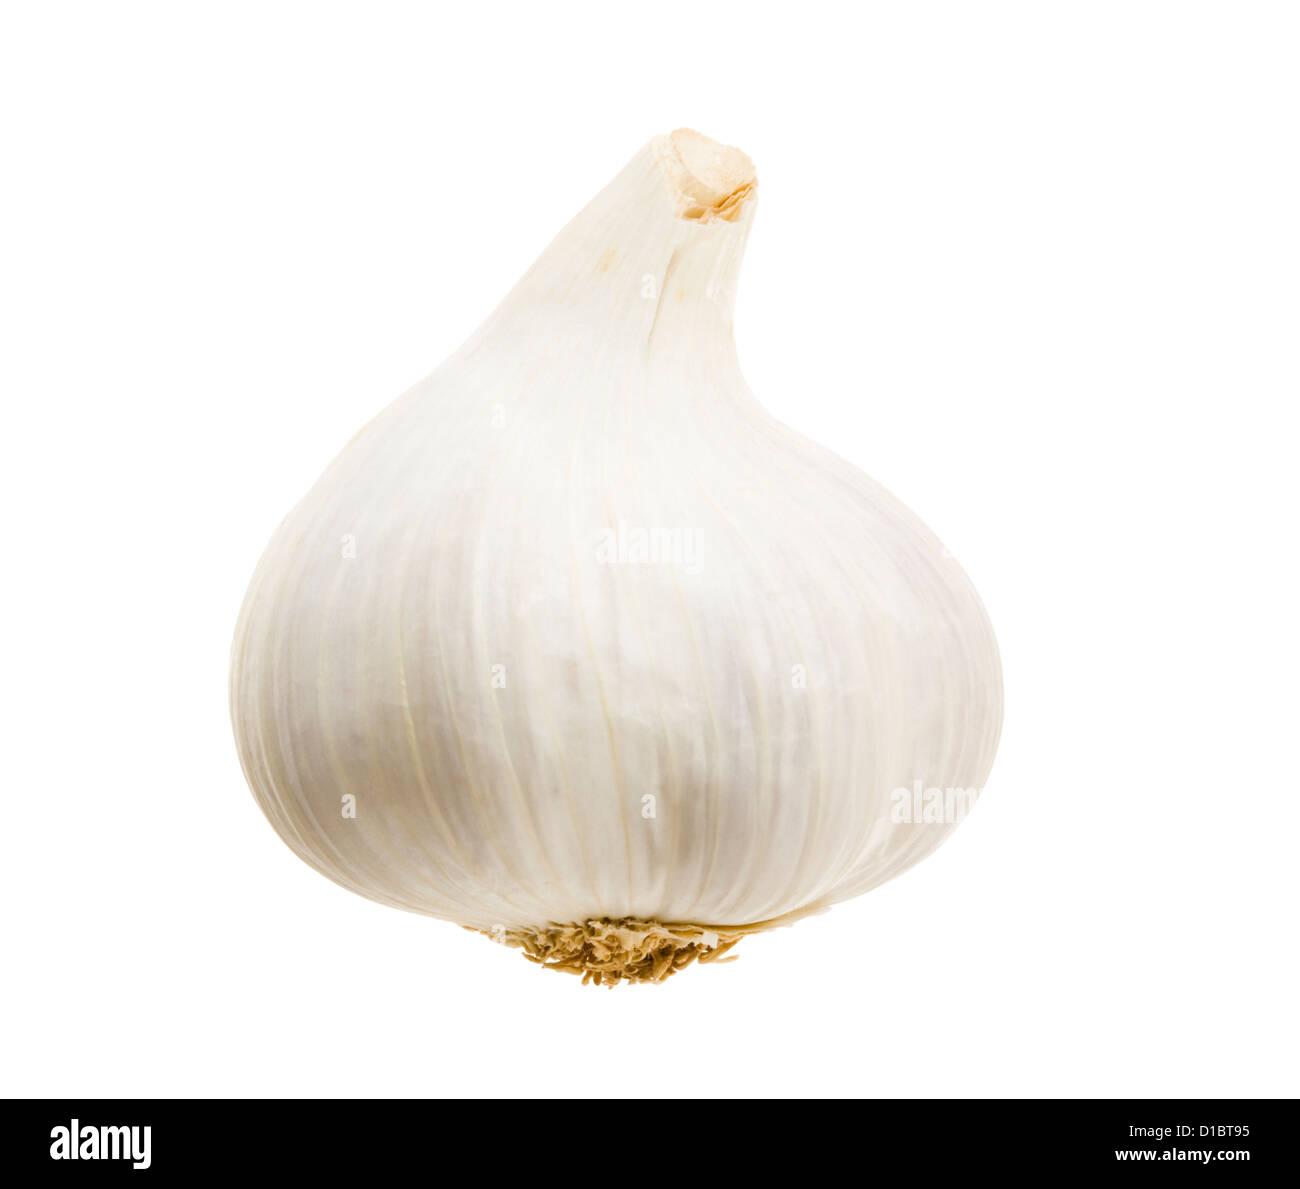 Garlic. - Stock Image